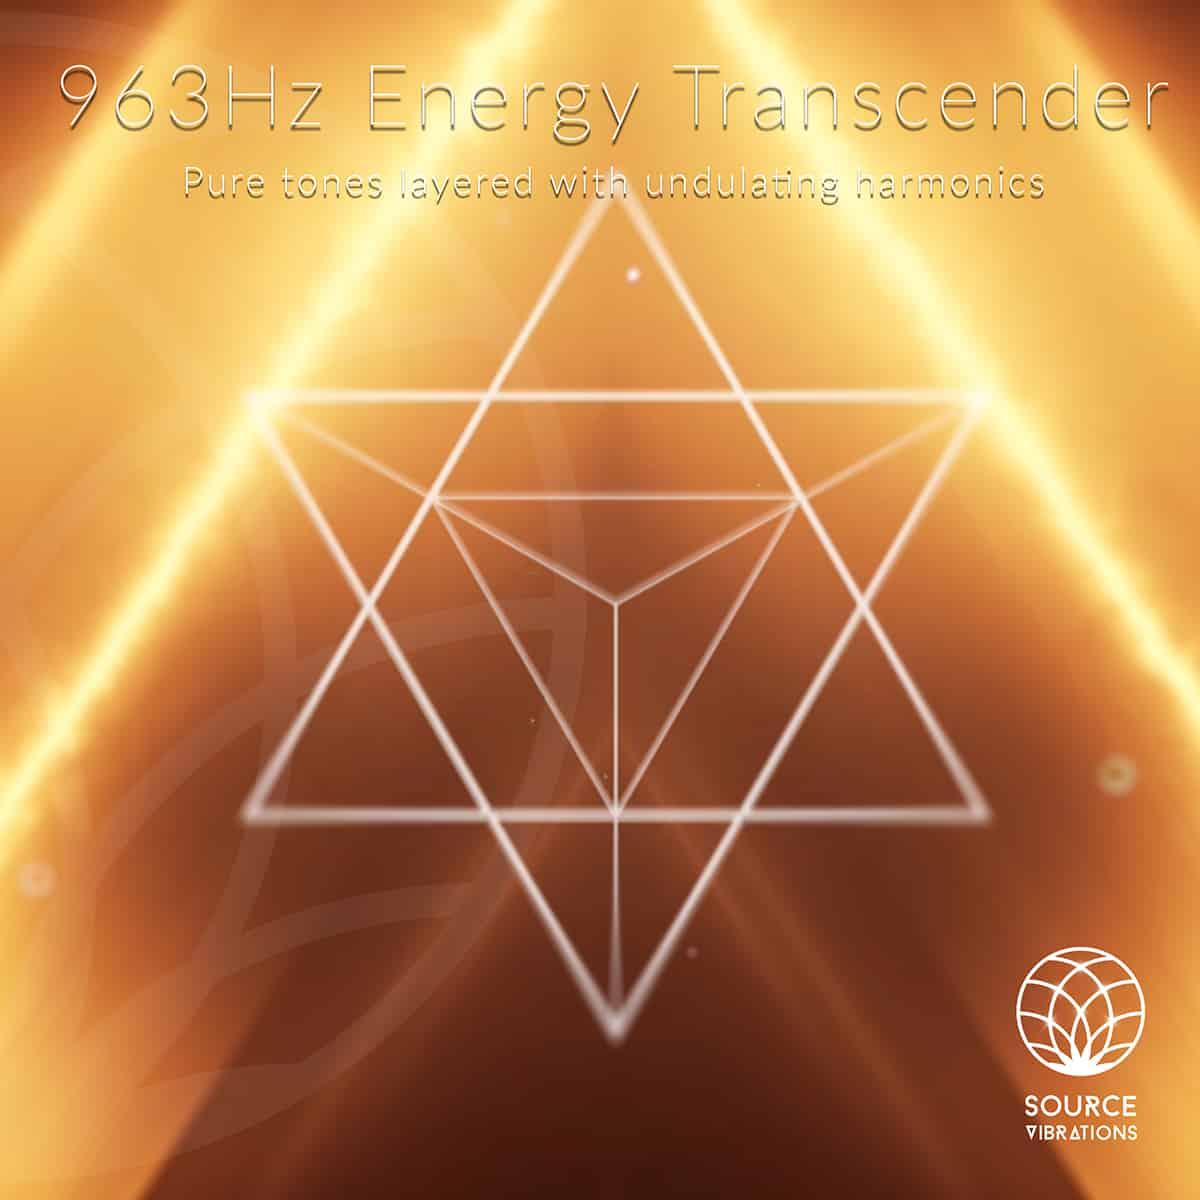 963Hz Energy Transcender   Pure Tones